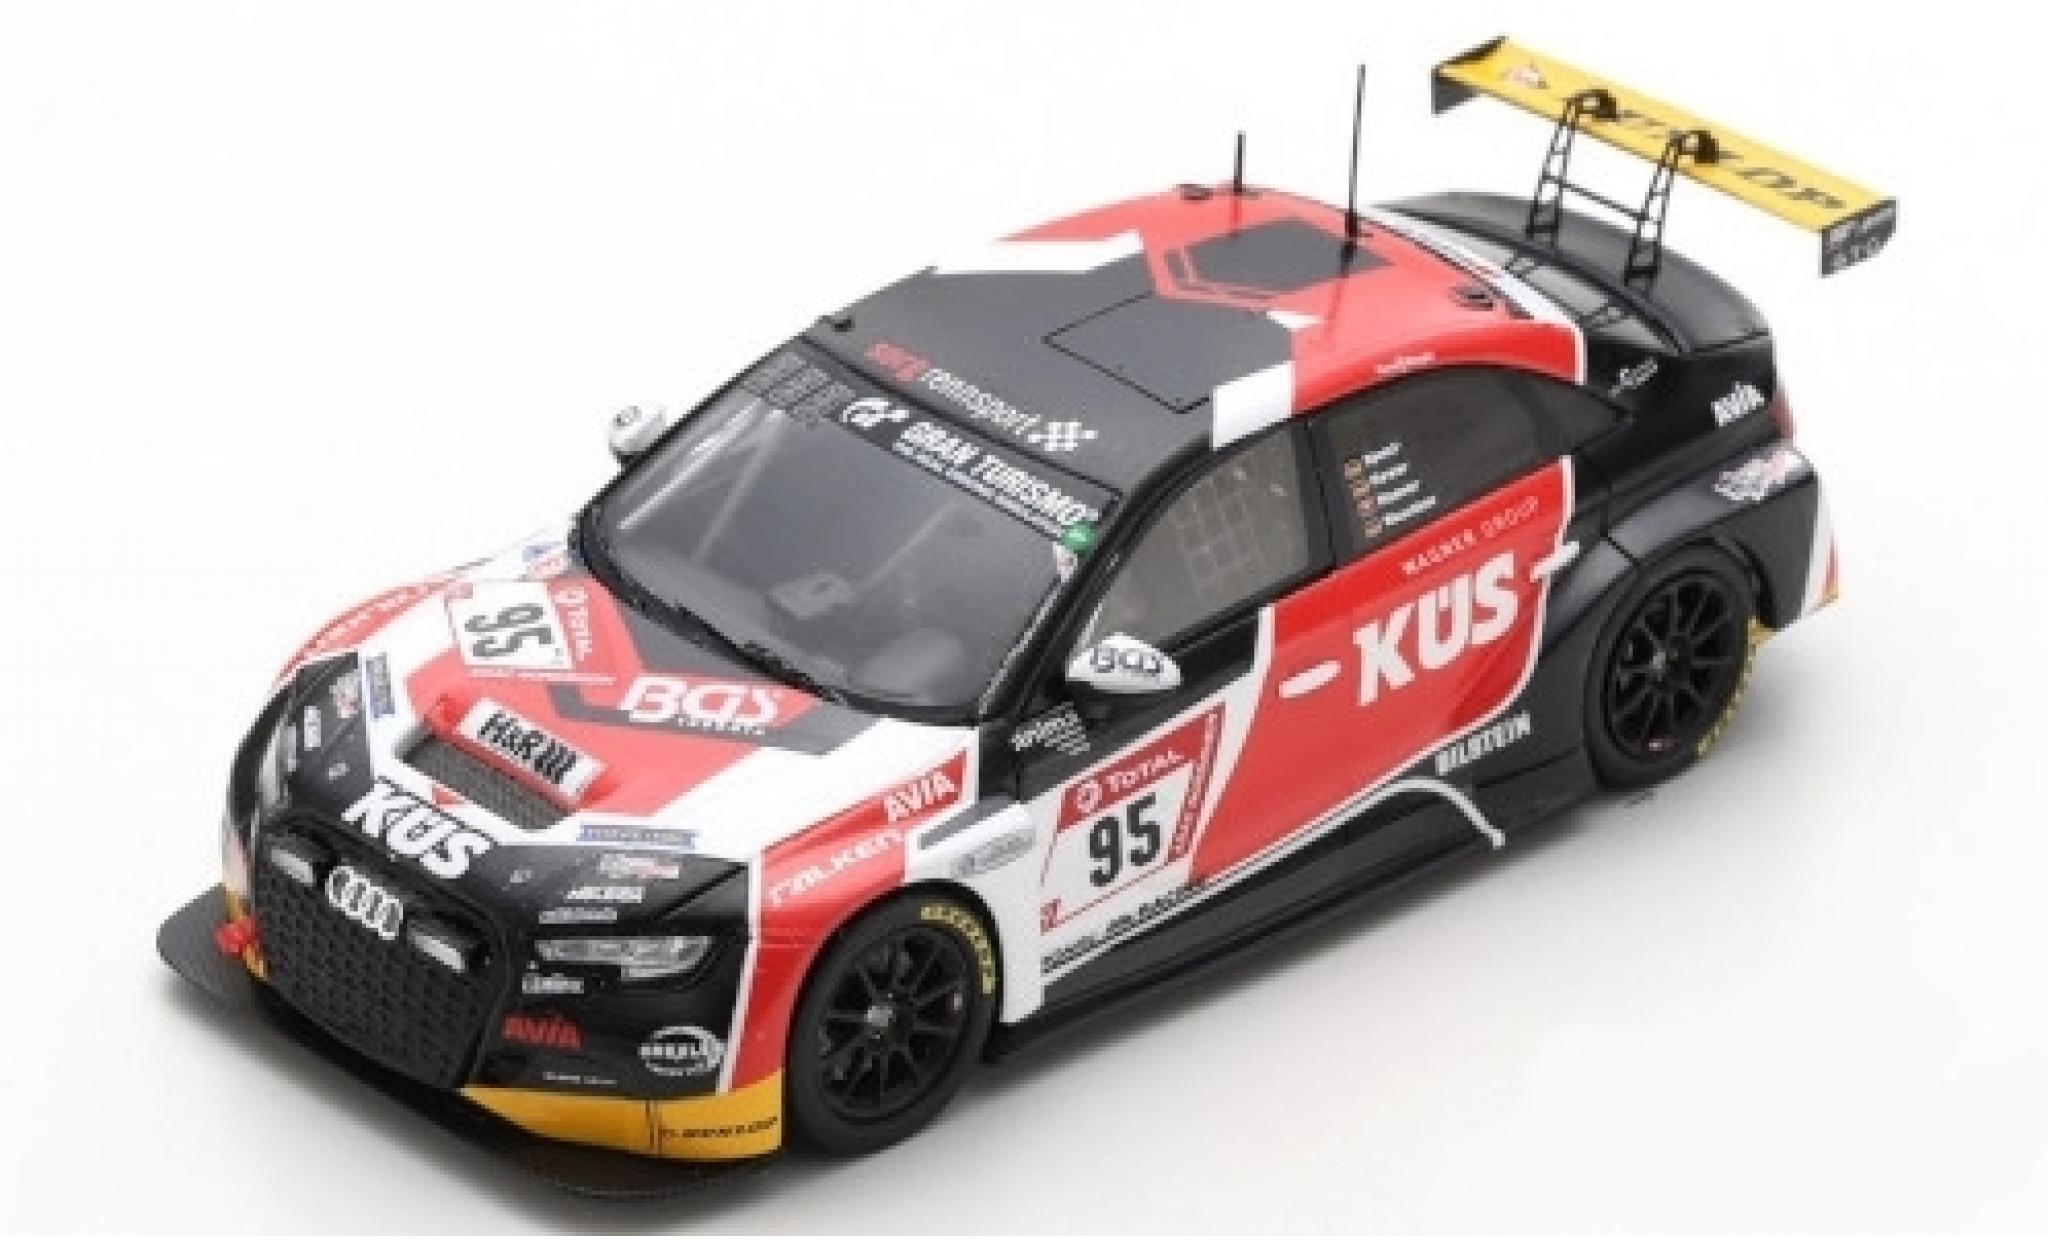 Audi RS3 1/43 Spark No.95 Team Avia Sorg Rennsport 24h Nürburgring 2019 P.Haener/C.Hewer/R.Speich/R.Waschkau